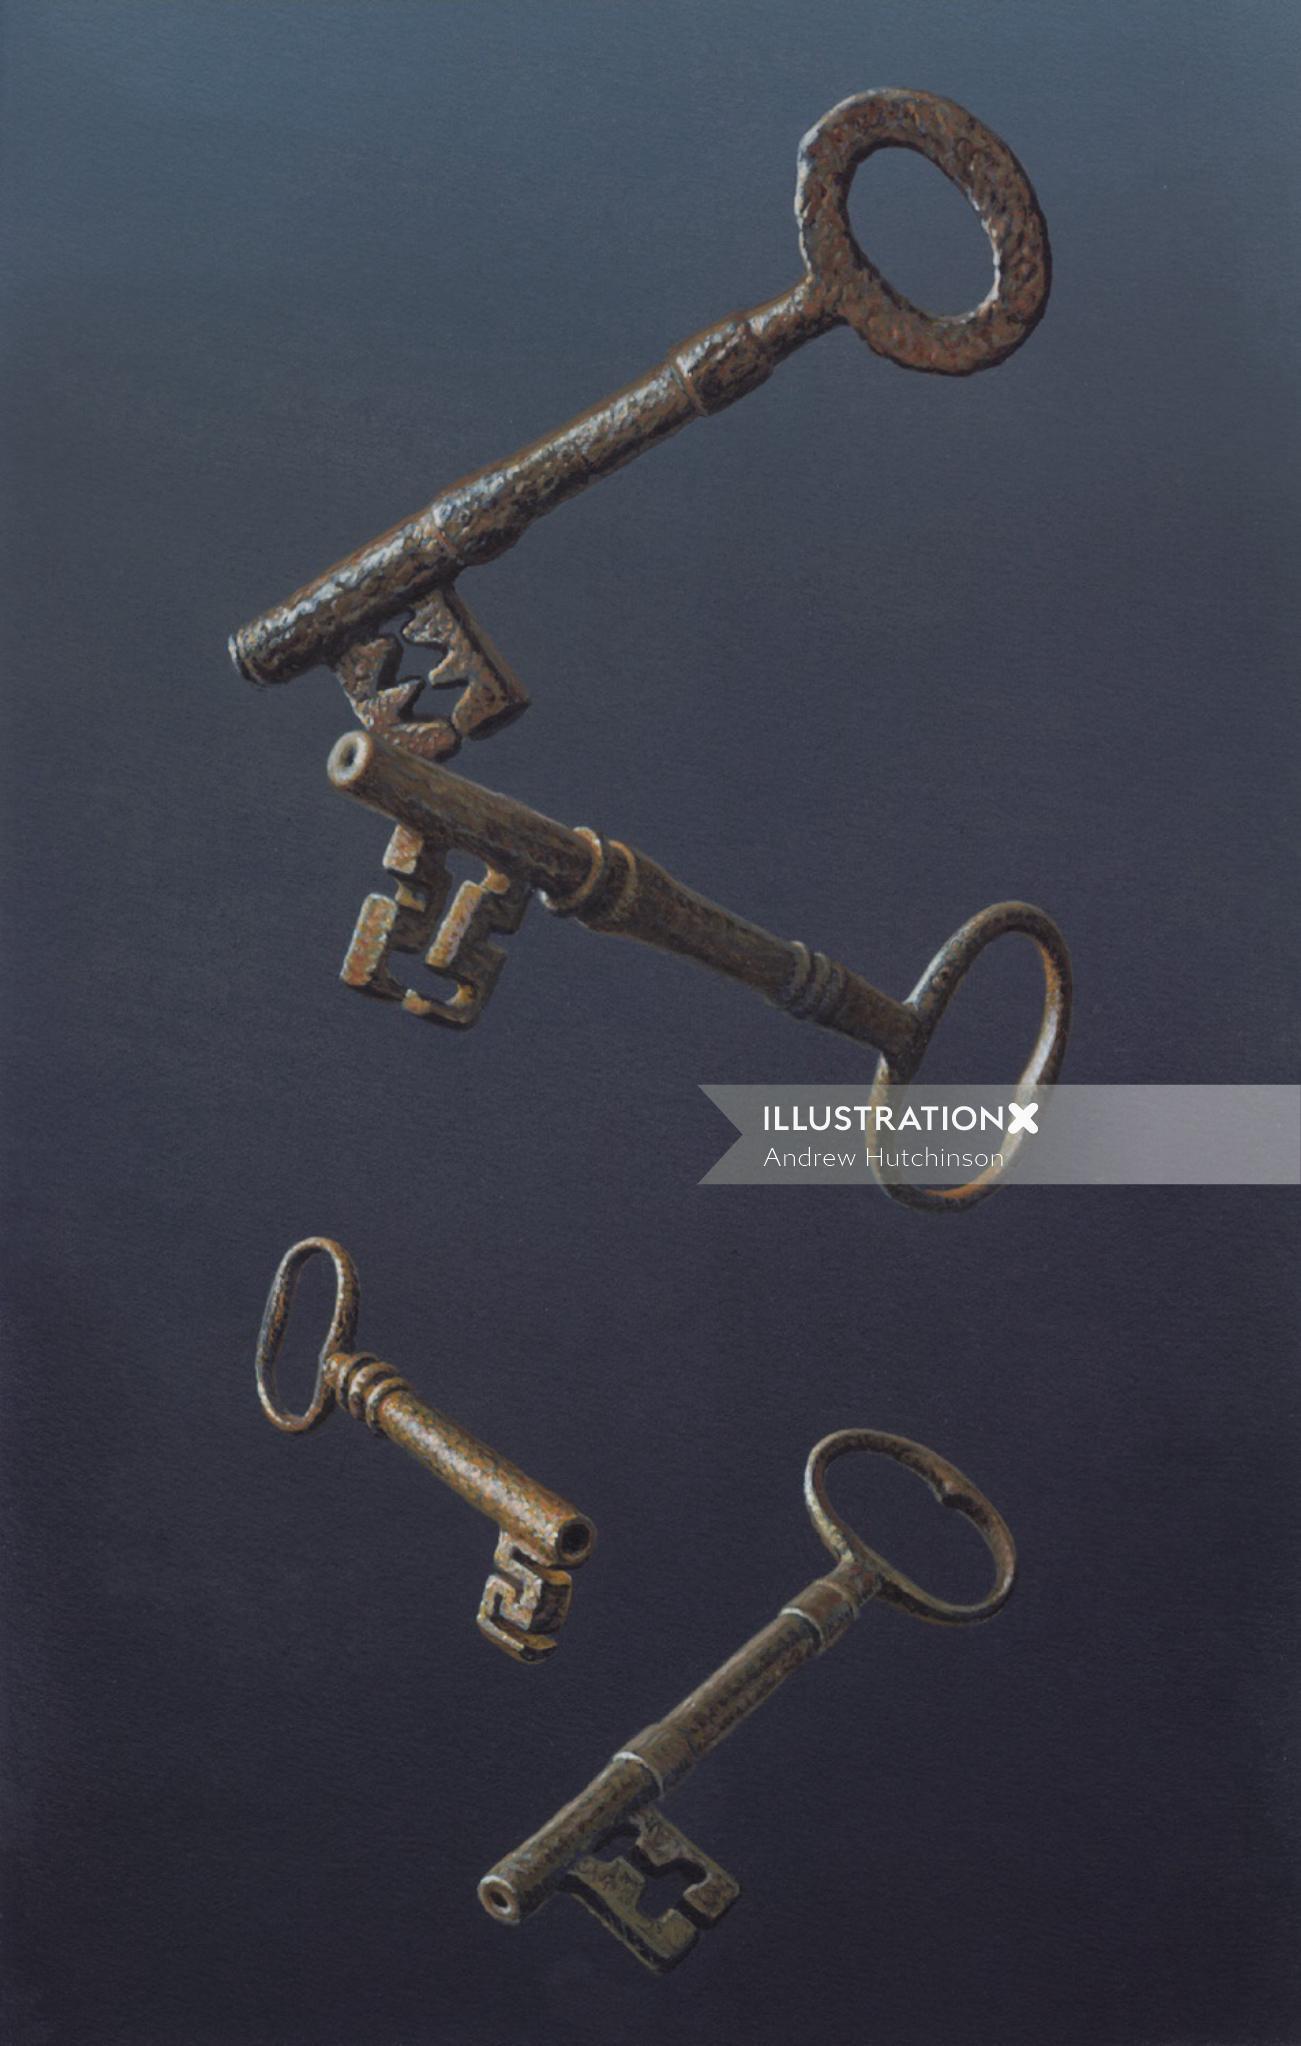 Metal keys illustration by Andrew Hutchinson